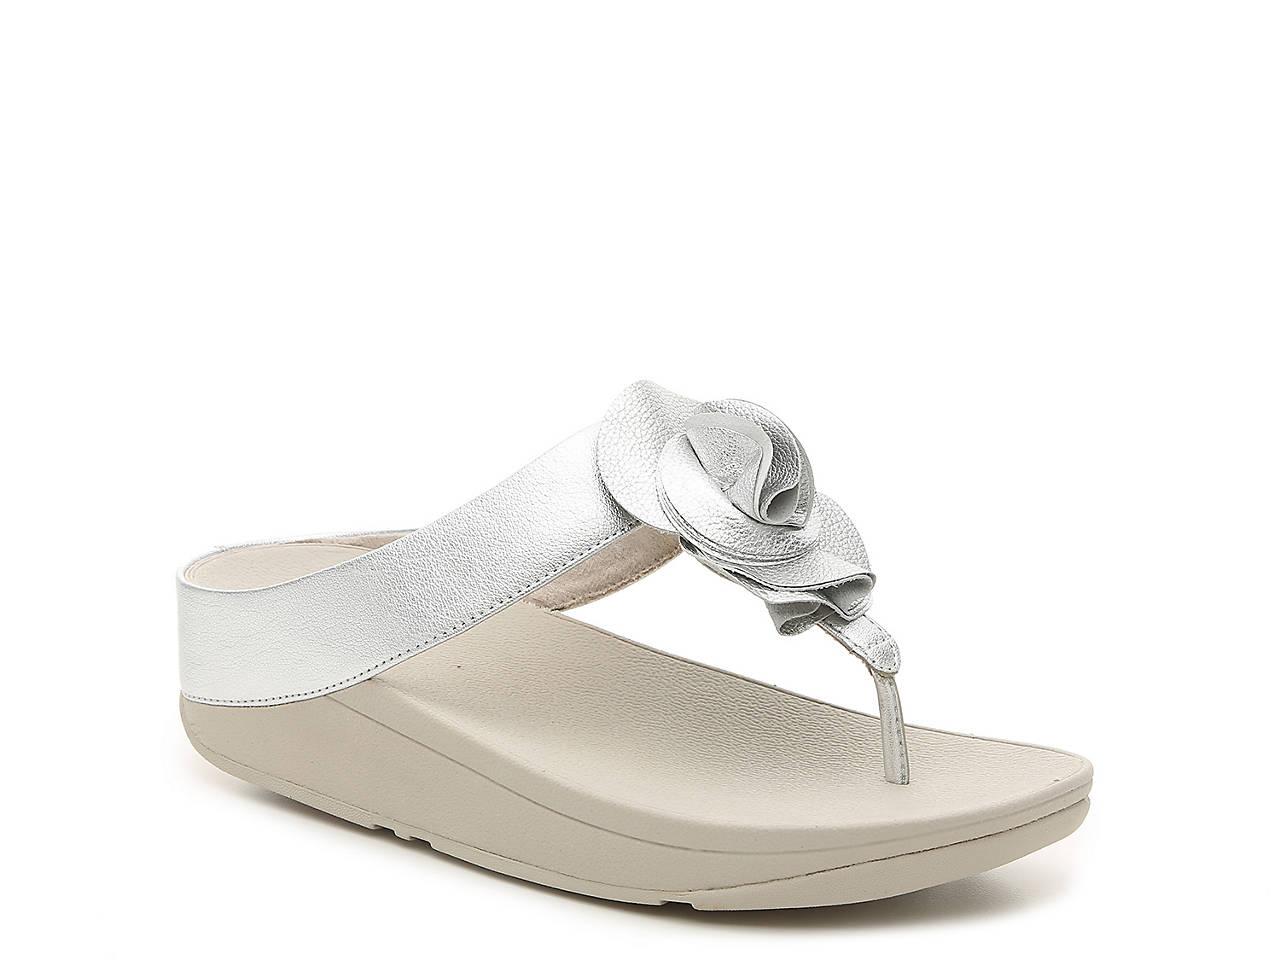 34e454da9073 FitFlop Florrie Wedge Sandal Women s Shoes